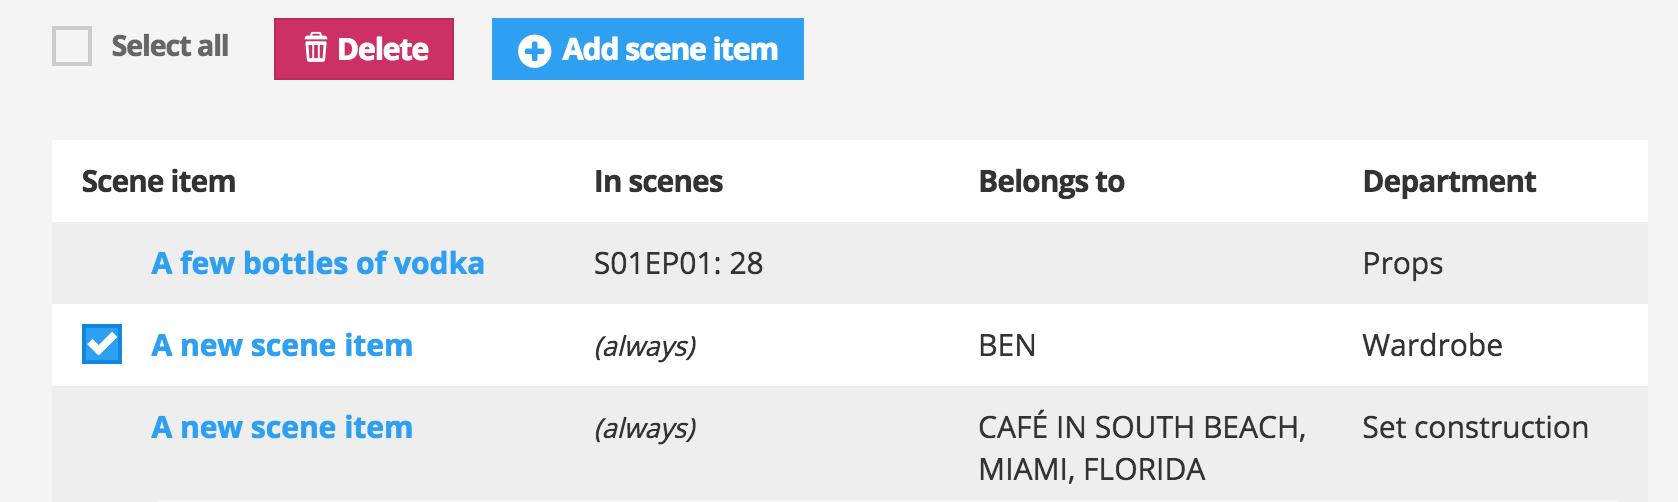 Scene item list